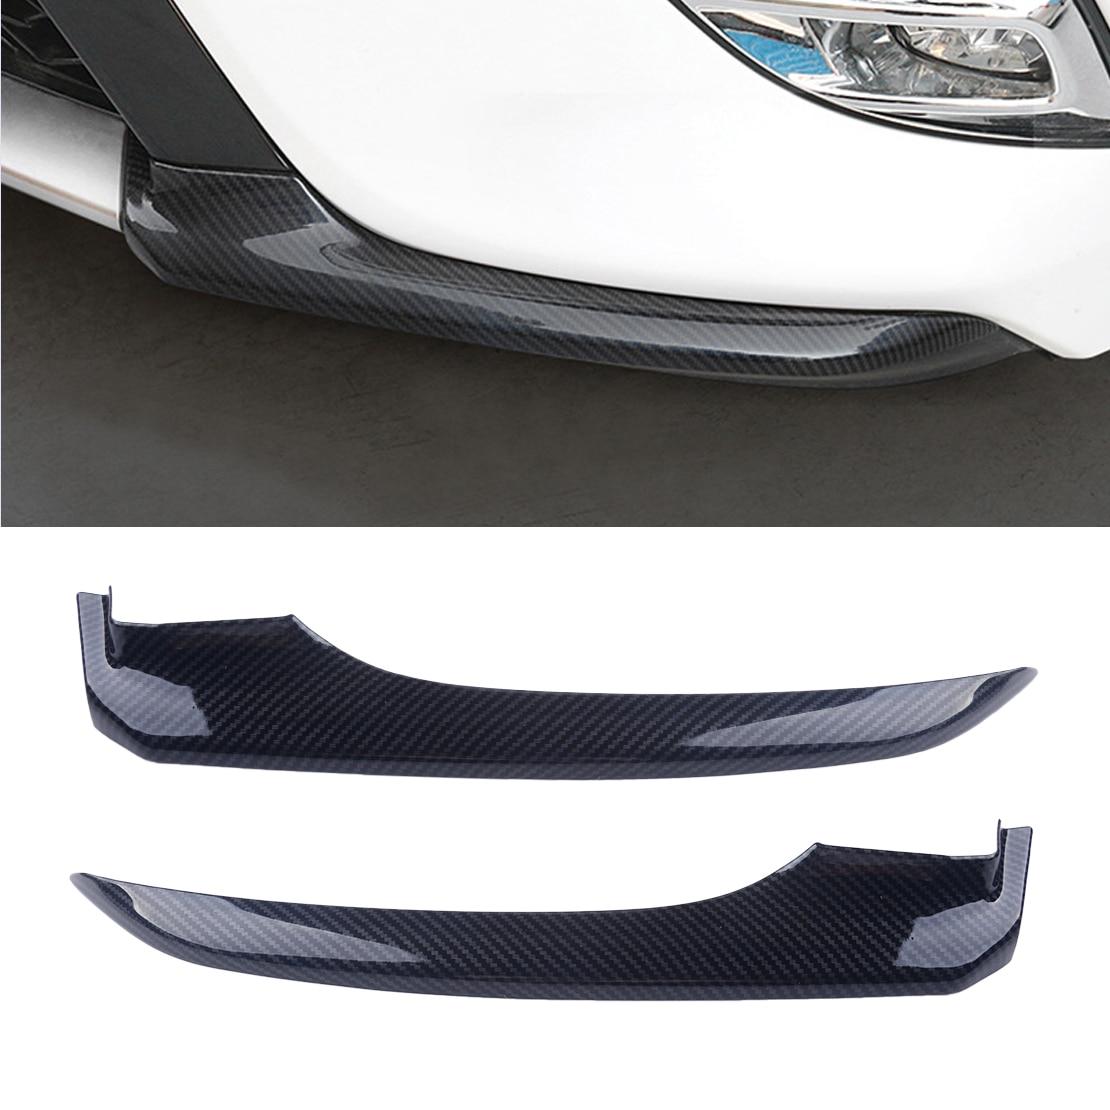 DWCX 2 uds textura de fibra de carbono para coche parachoques delantero cubierta de esquina embellecedor pegatina ABS apto para Toyota Camry 2018